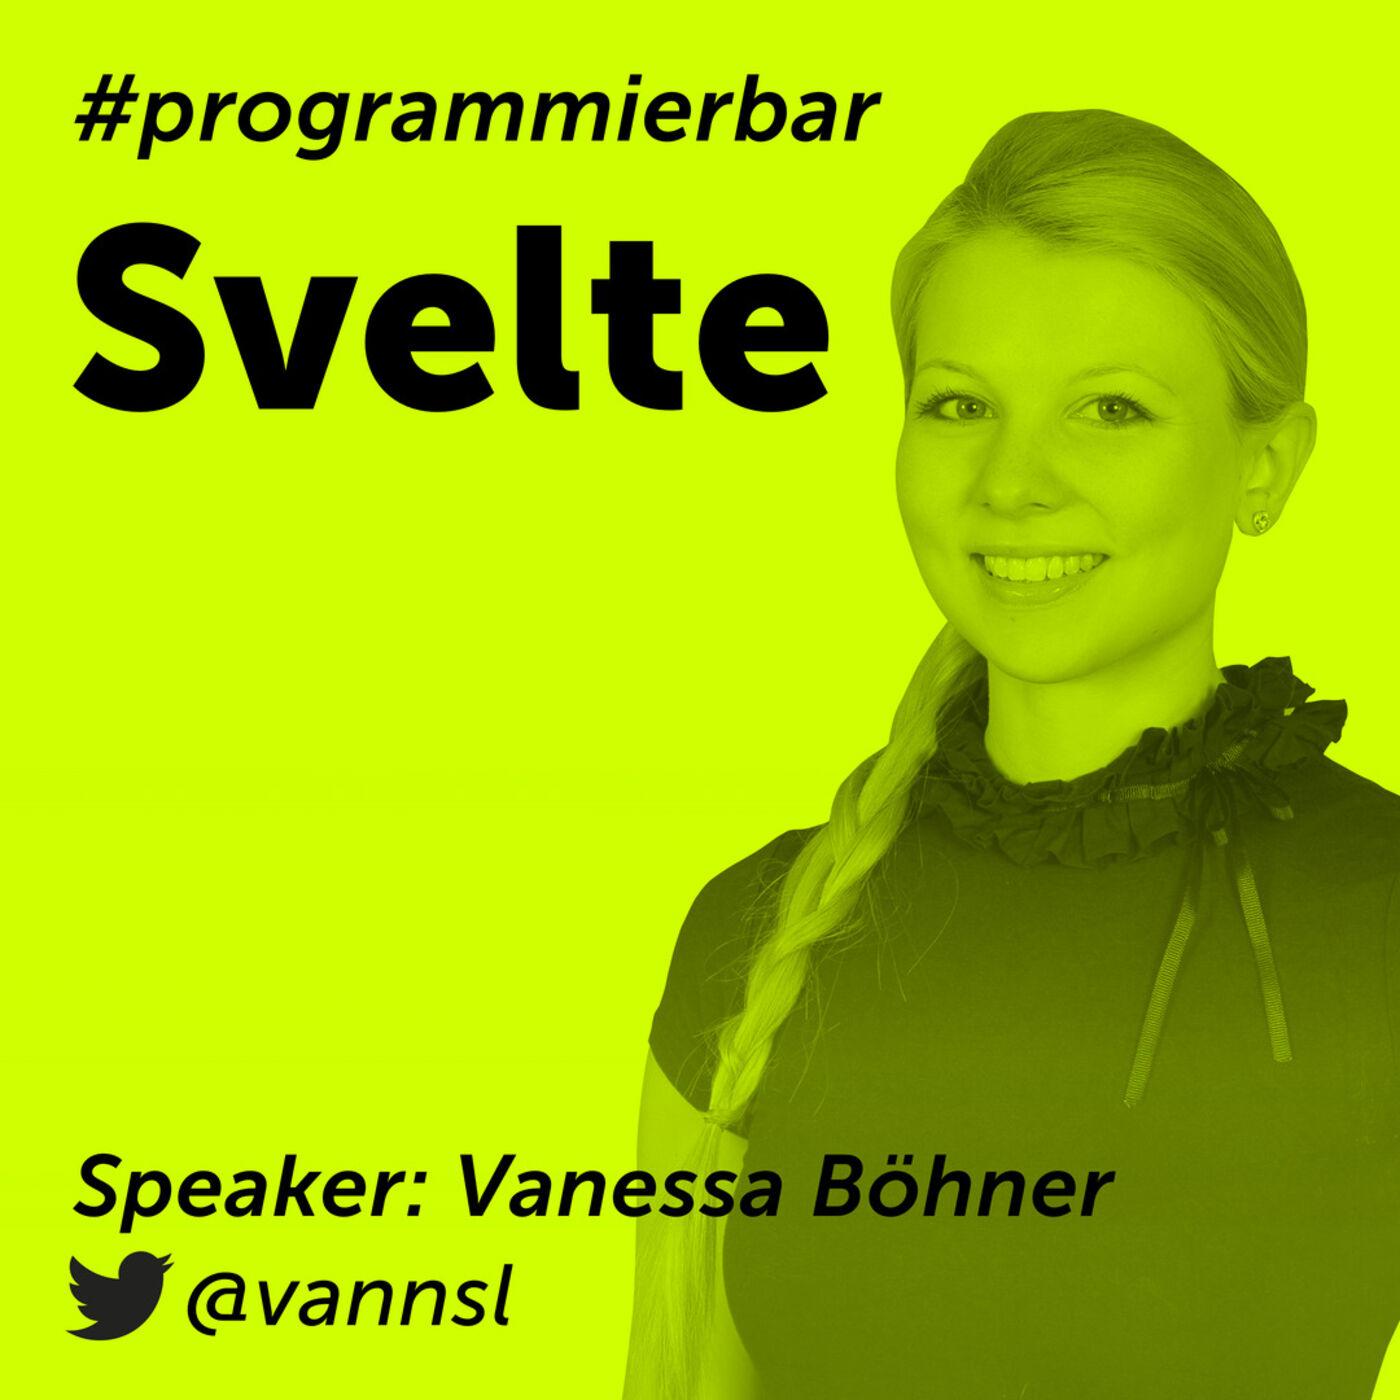 Folge 64 - Svelte mit Vanessa Böhner